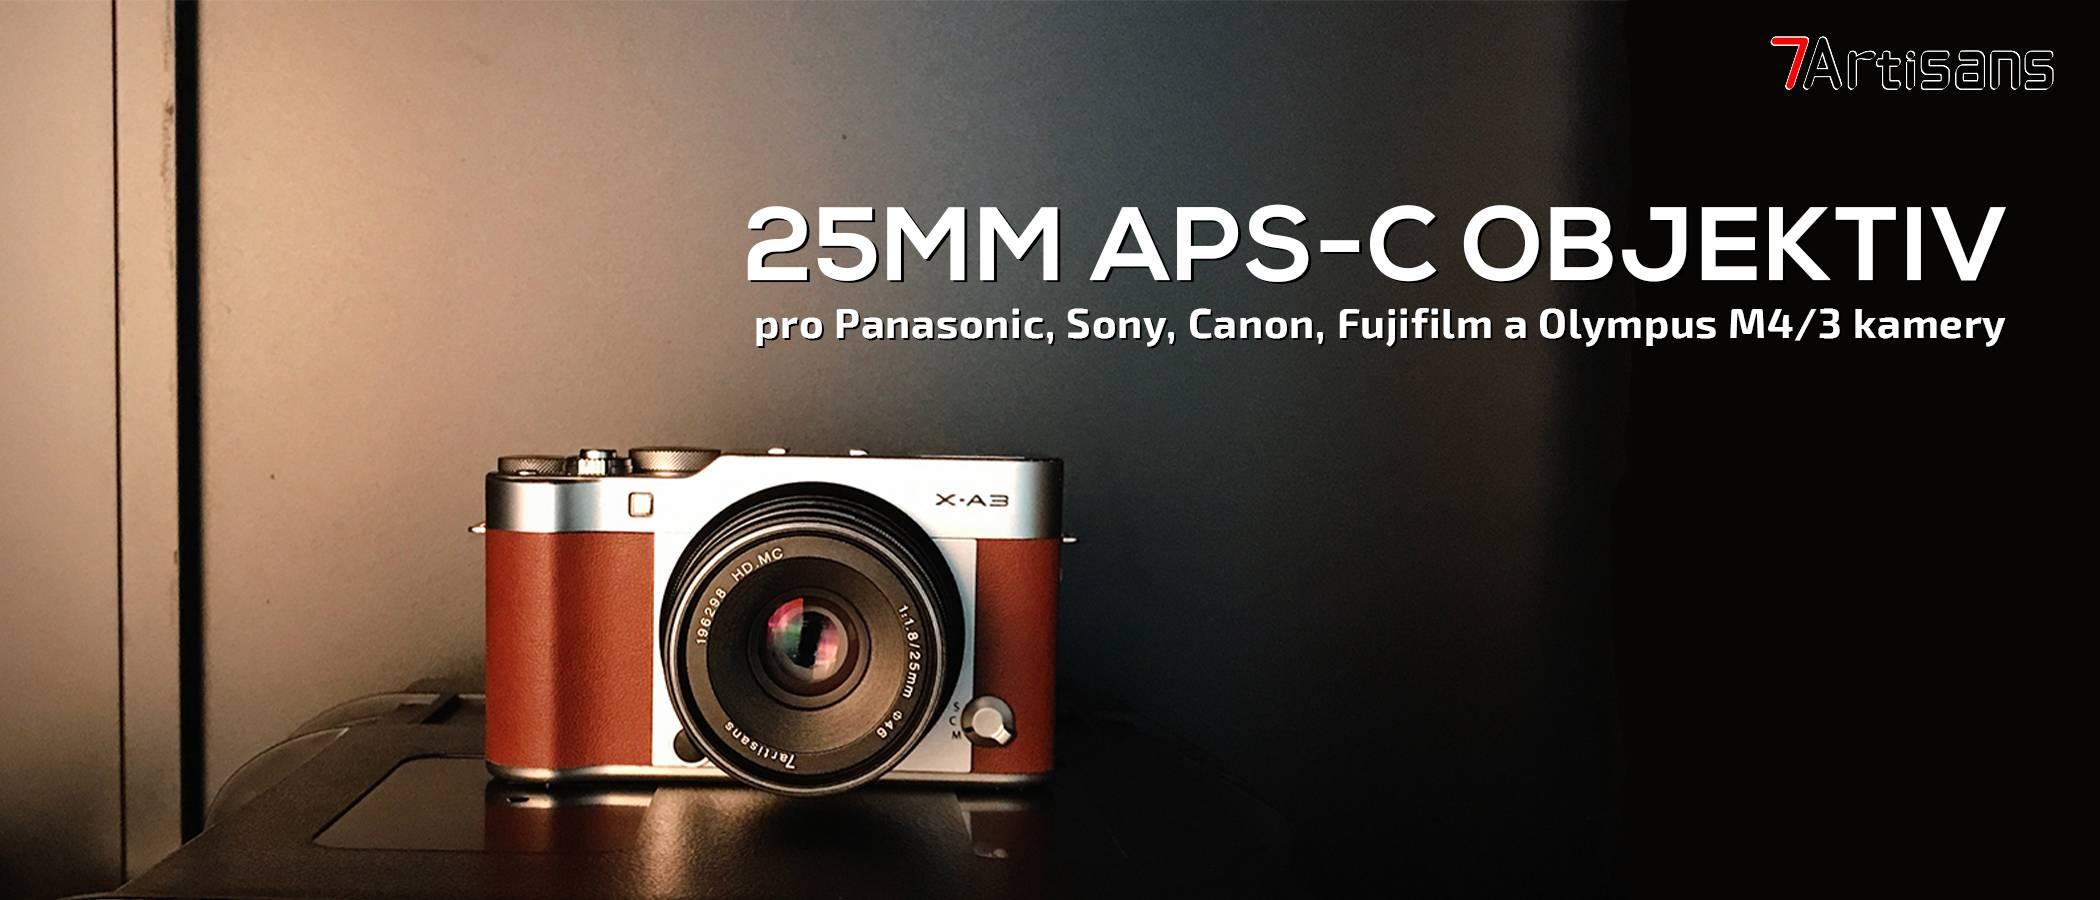 film-technika-7artisans-25-mm-aps-c-objektiv